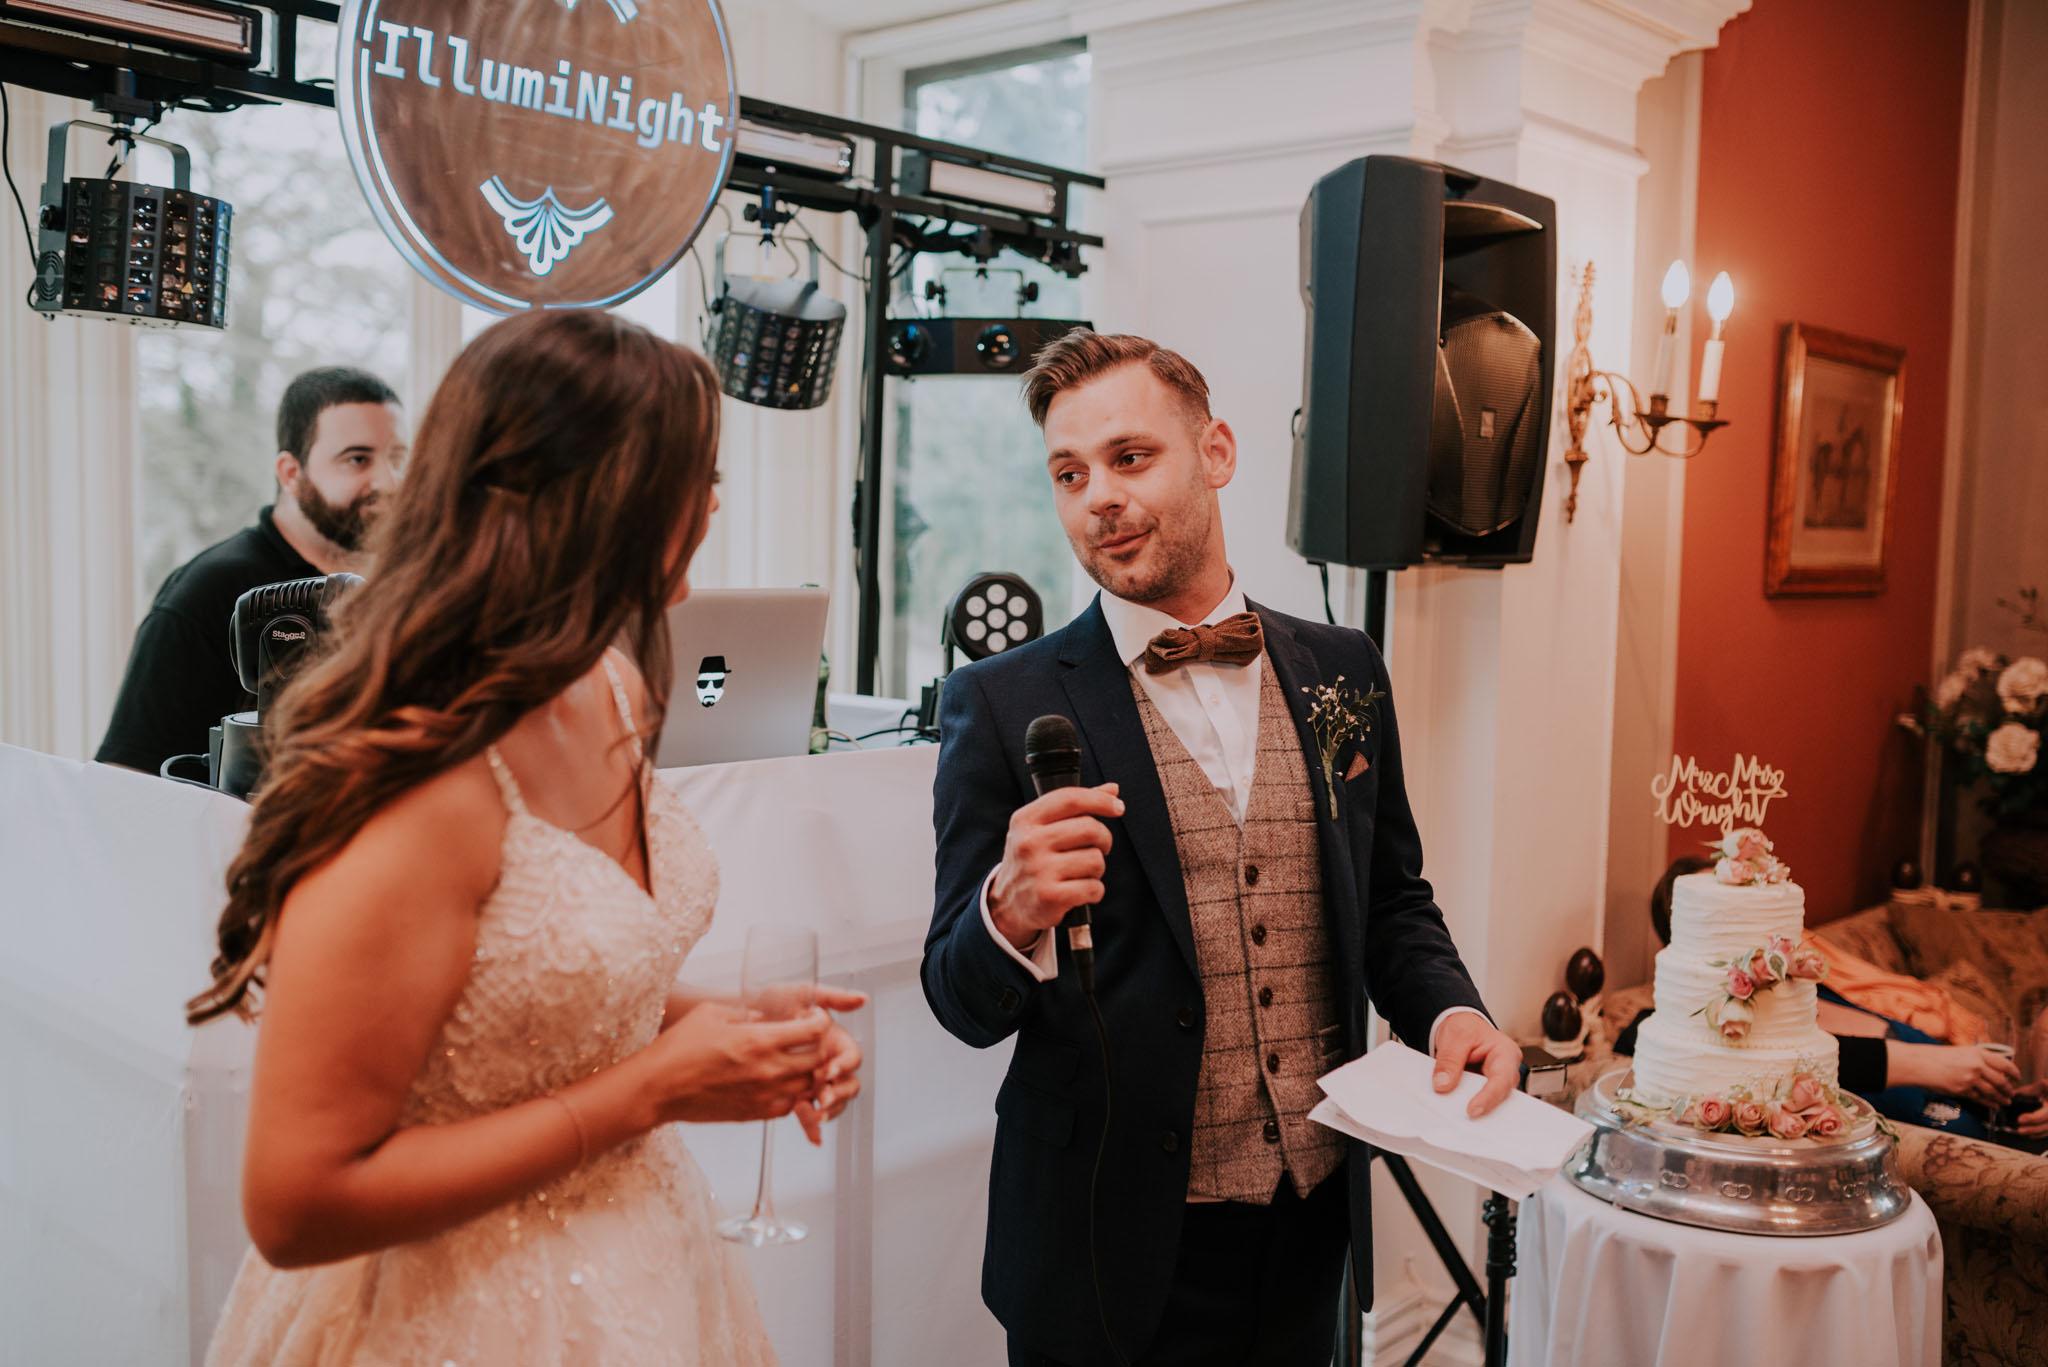 wedding-photographer-glewstone-court-hereford-scott-stockwell-photography443.jpg